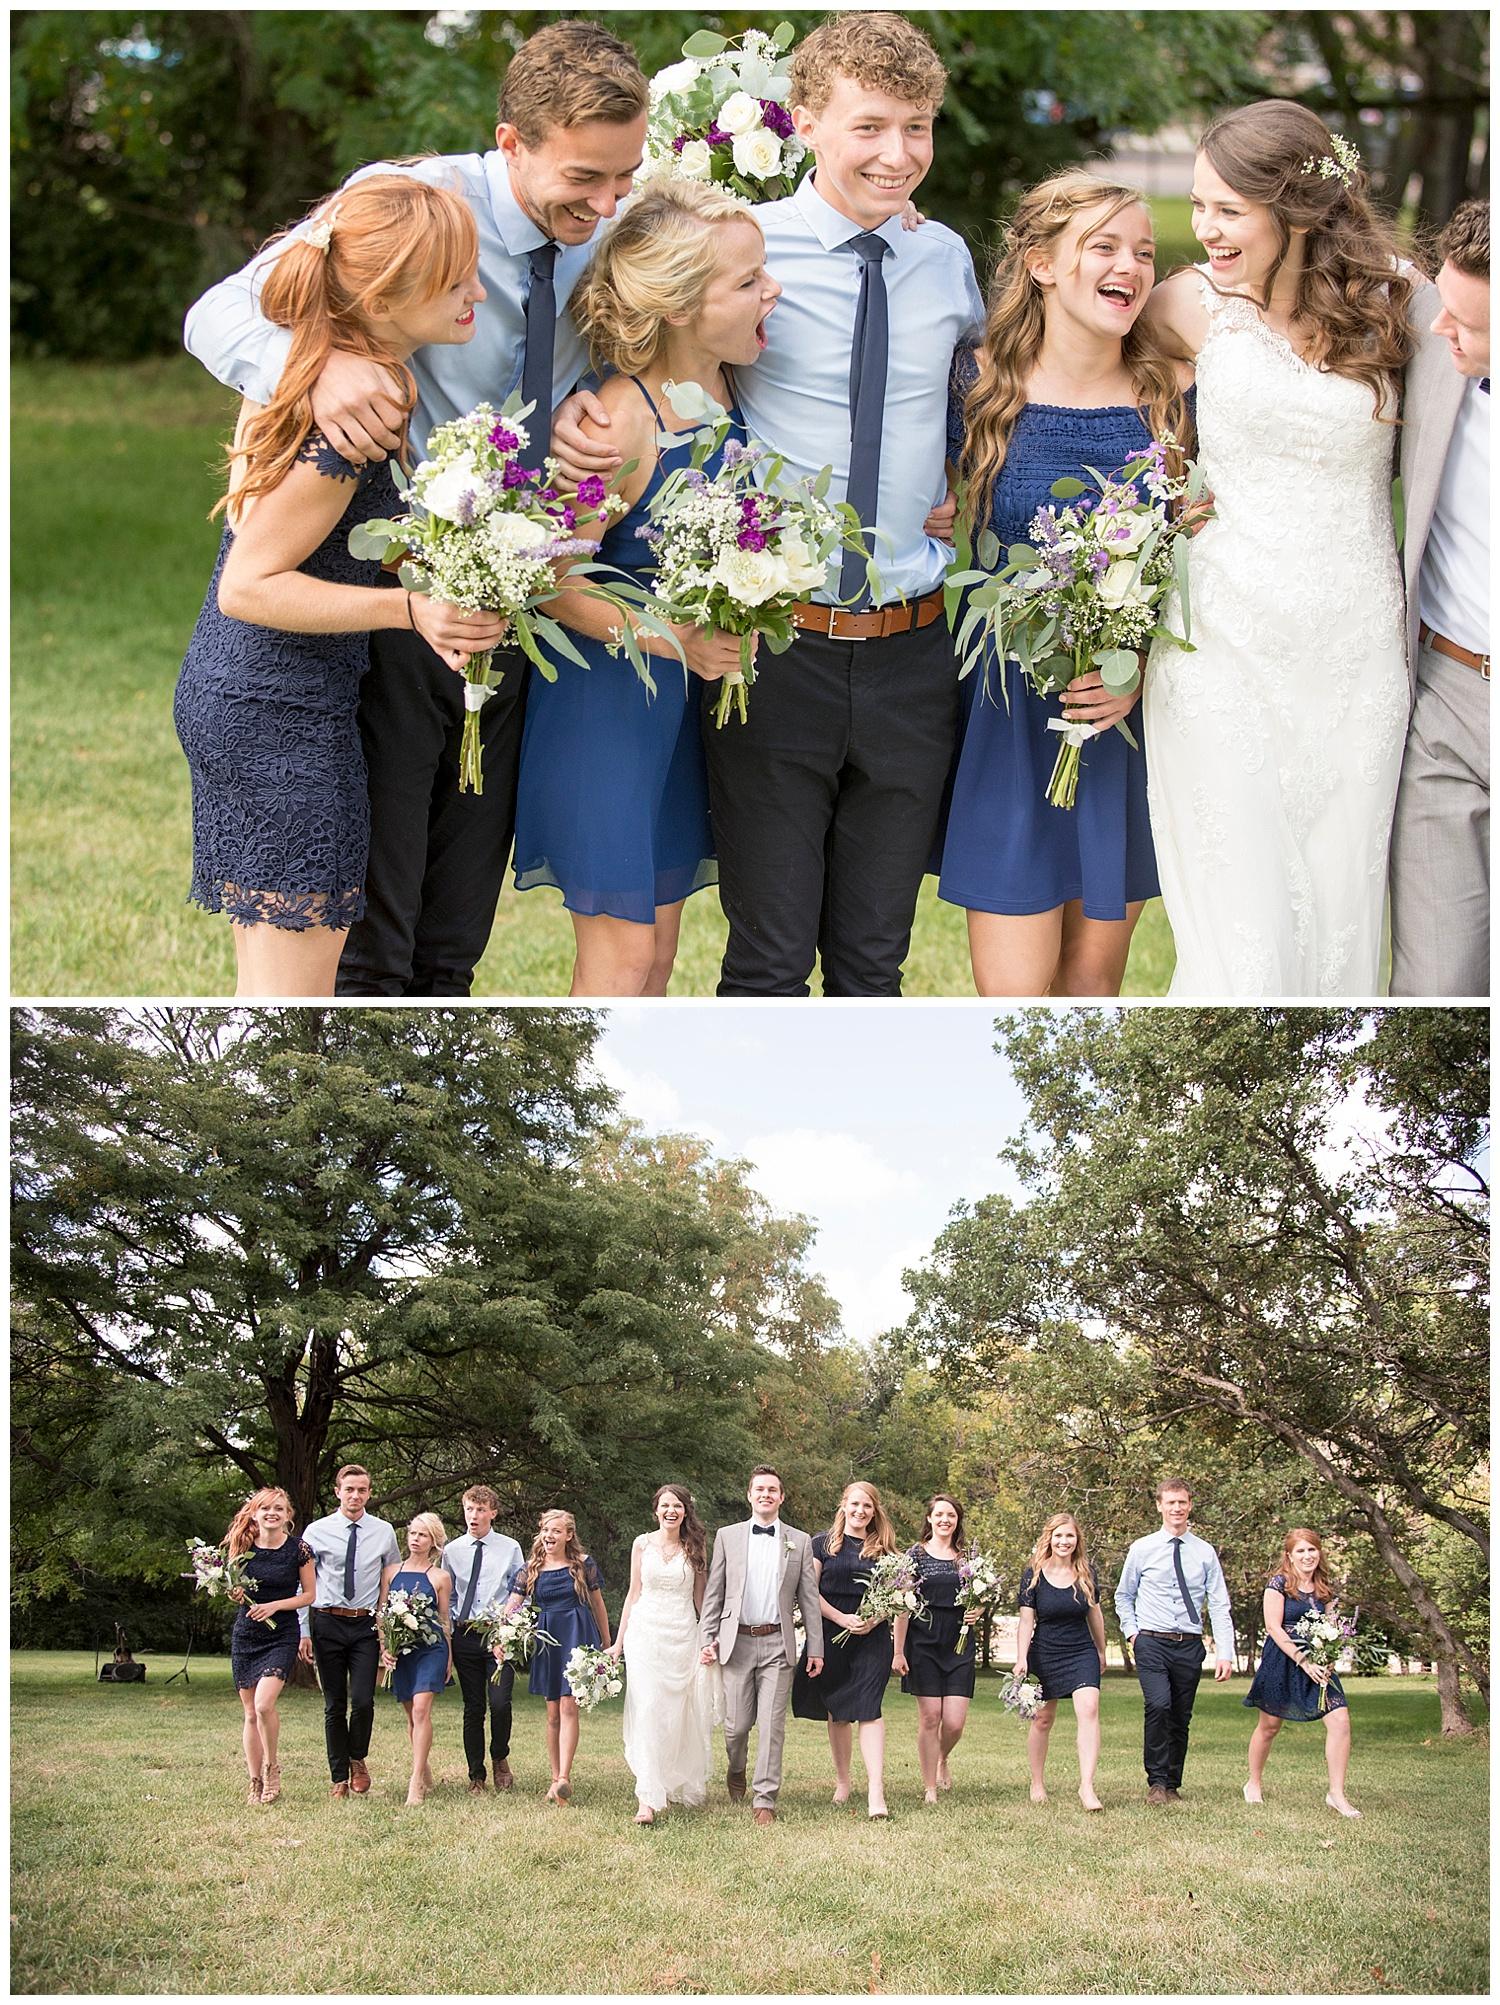 Fun Wedding Photography   Bethany and Jono's Intimate DIY Wedding   Colorado Springs Wedding Photographer   Farm Wedding Photographer   Apollo Fields Wedding Photojournalism